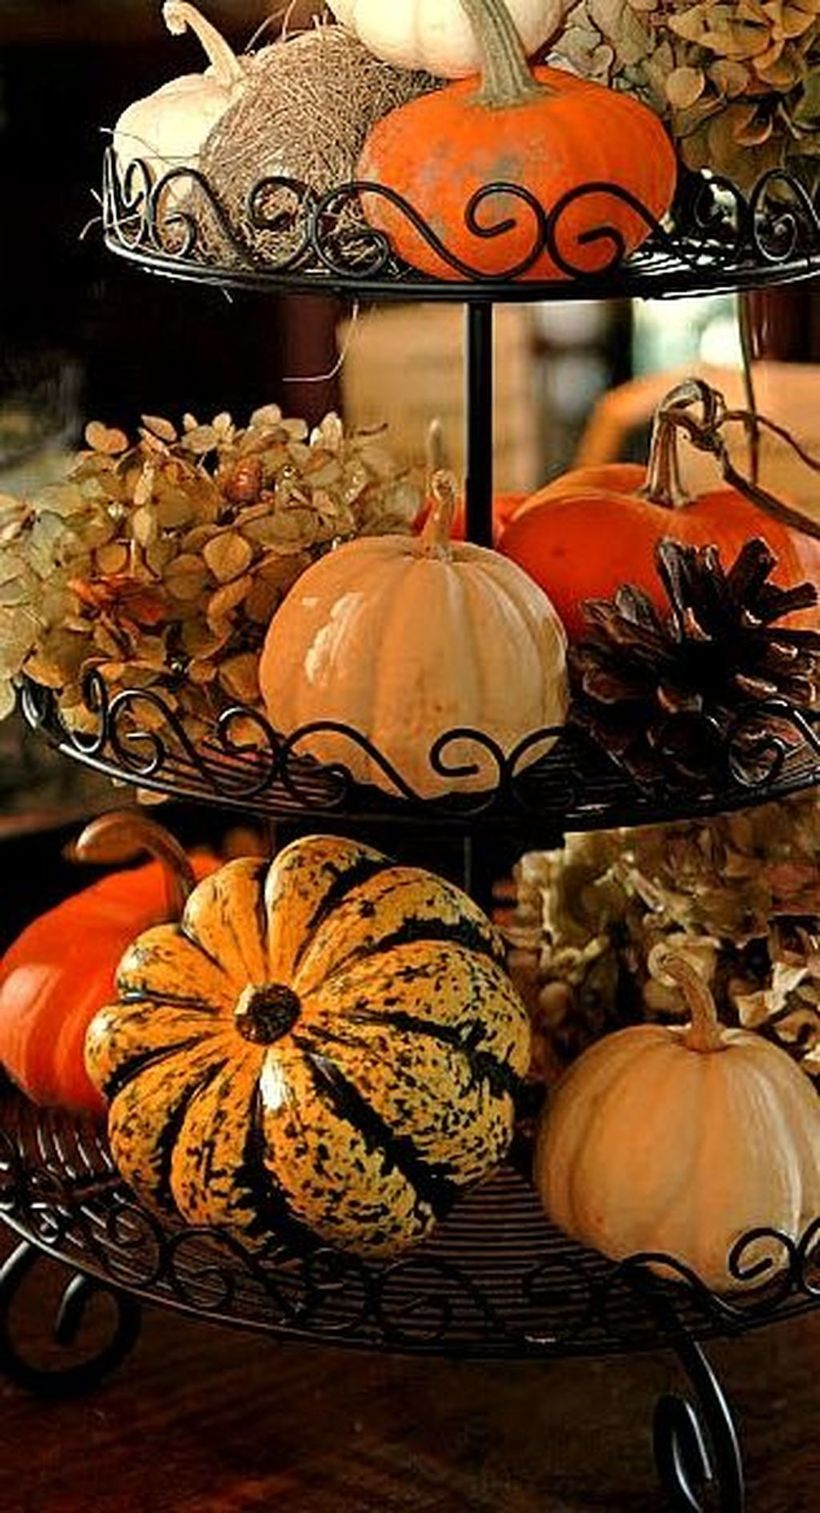 Unusual pumpkins for centerpiece decoration